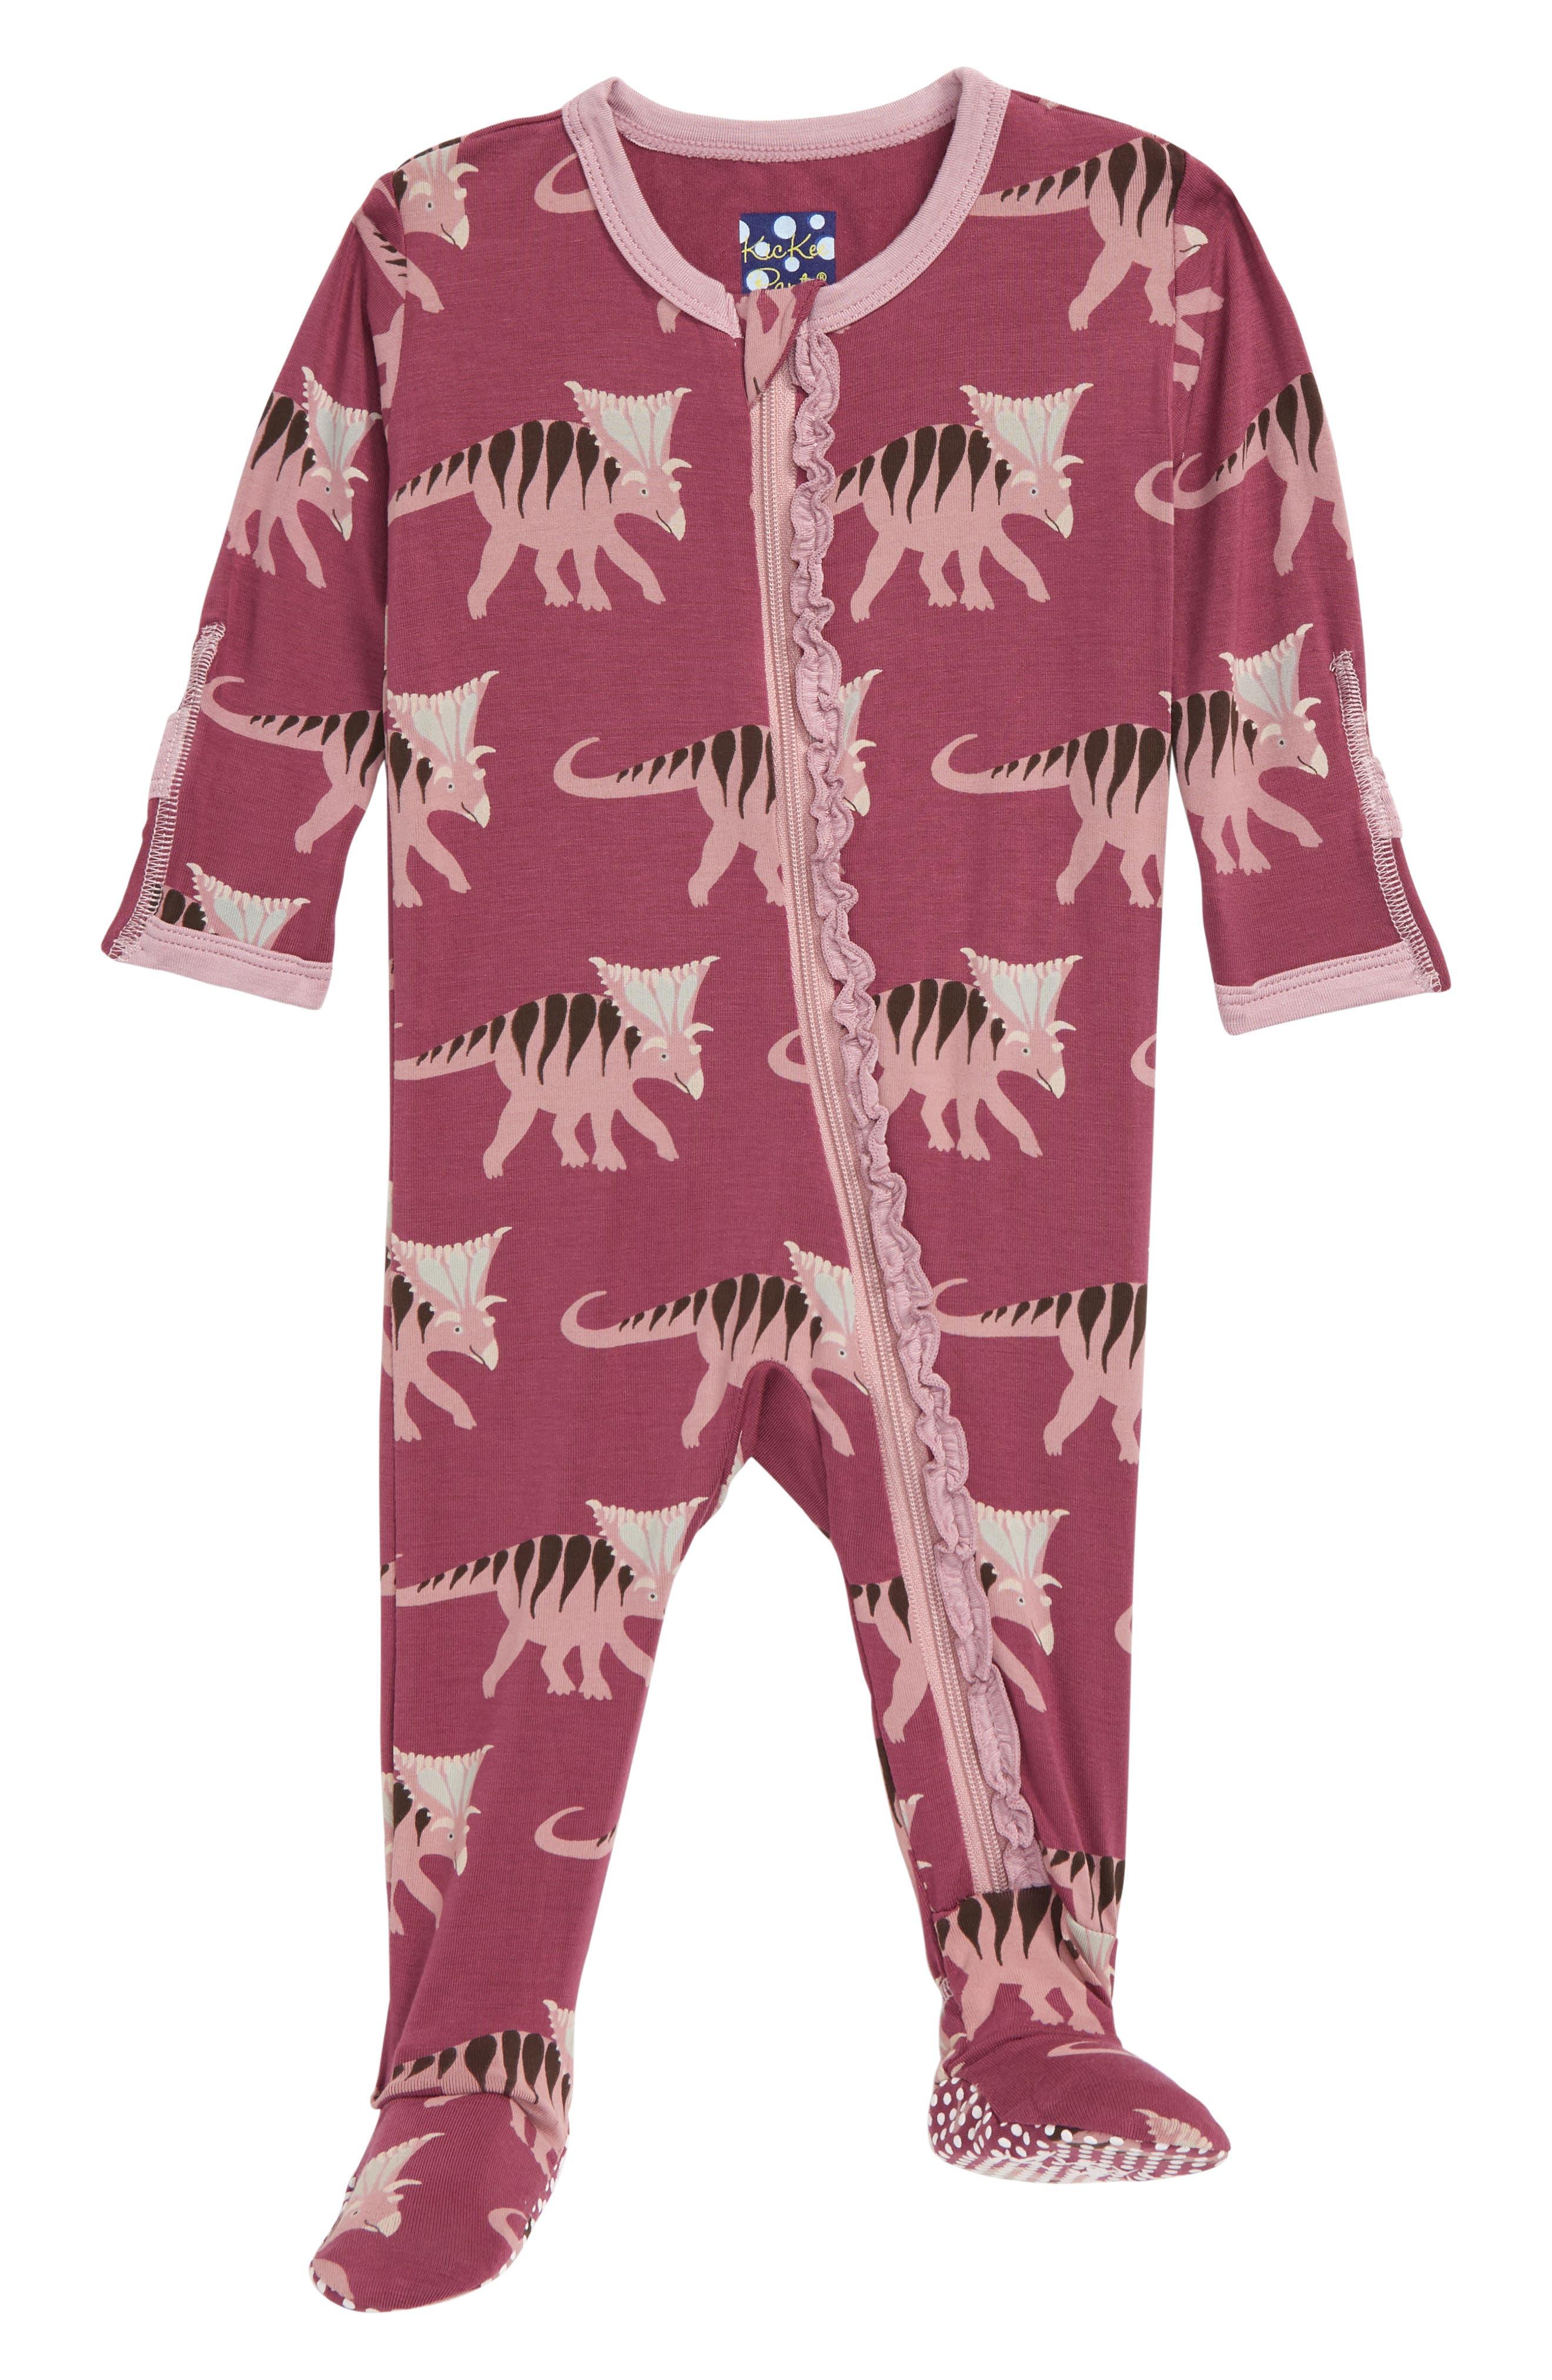 Infant Girls Kickee Pants Muffin Ruffle Footie Size 1218M  Purple